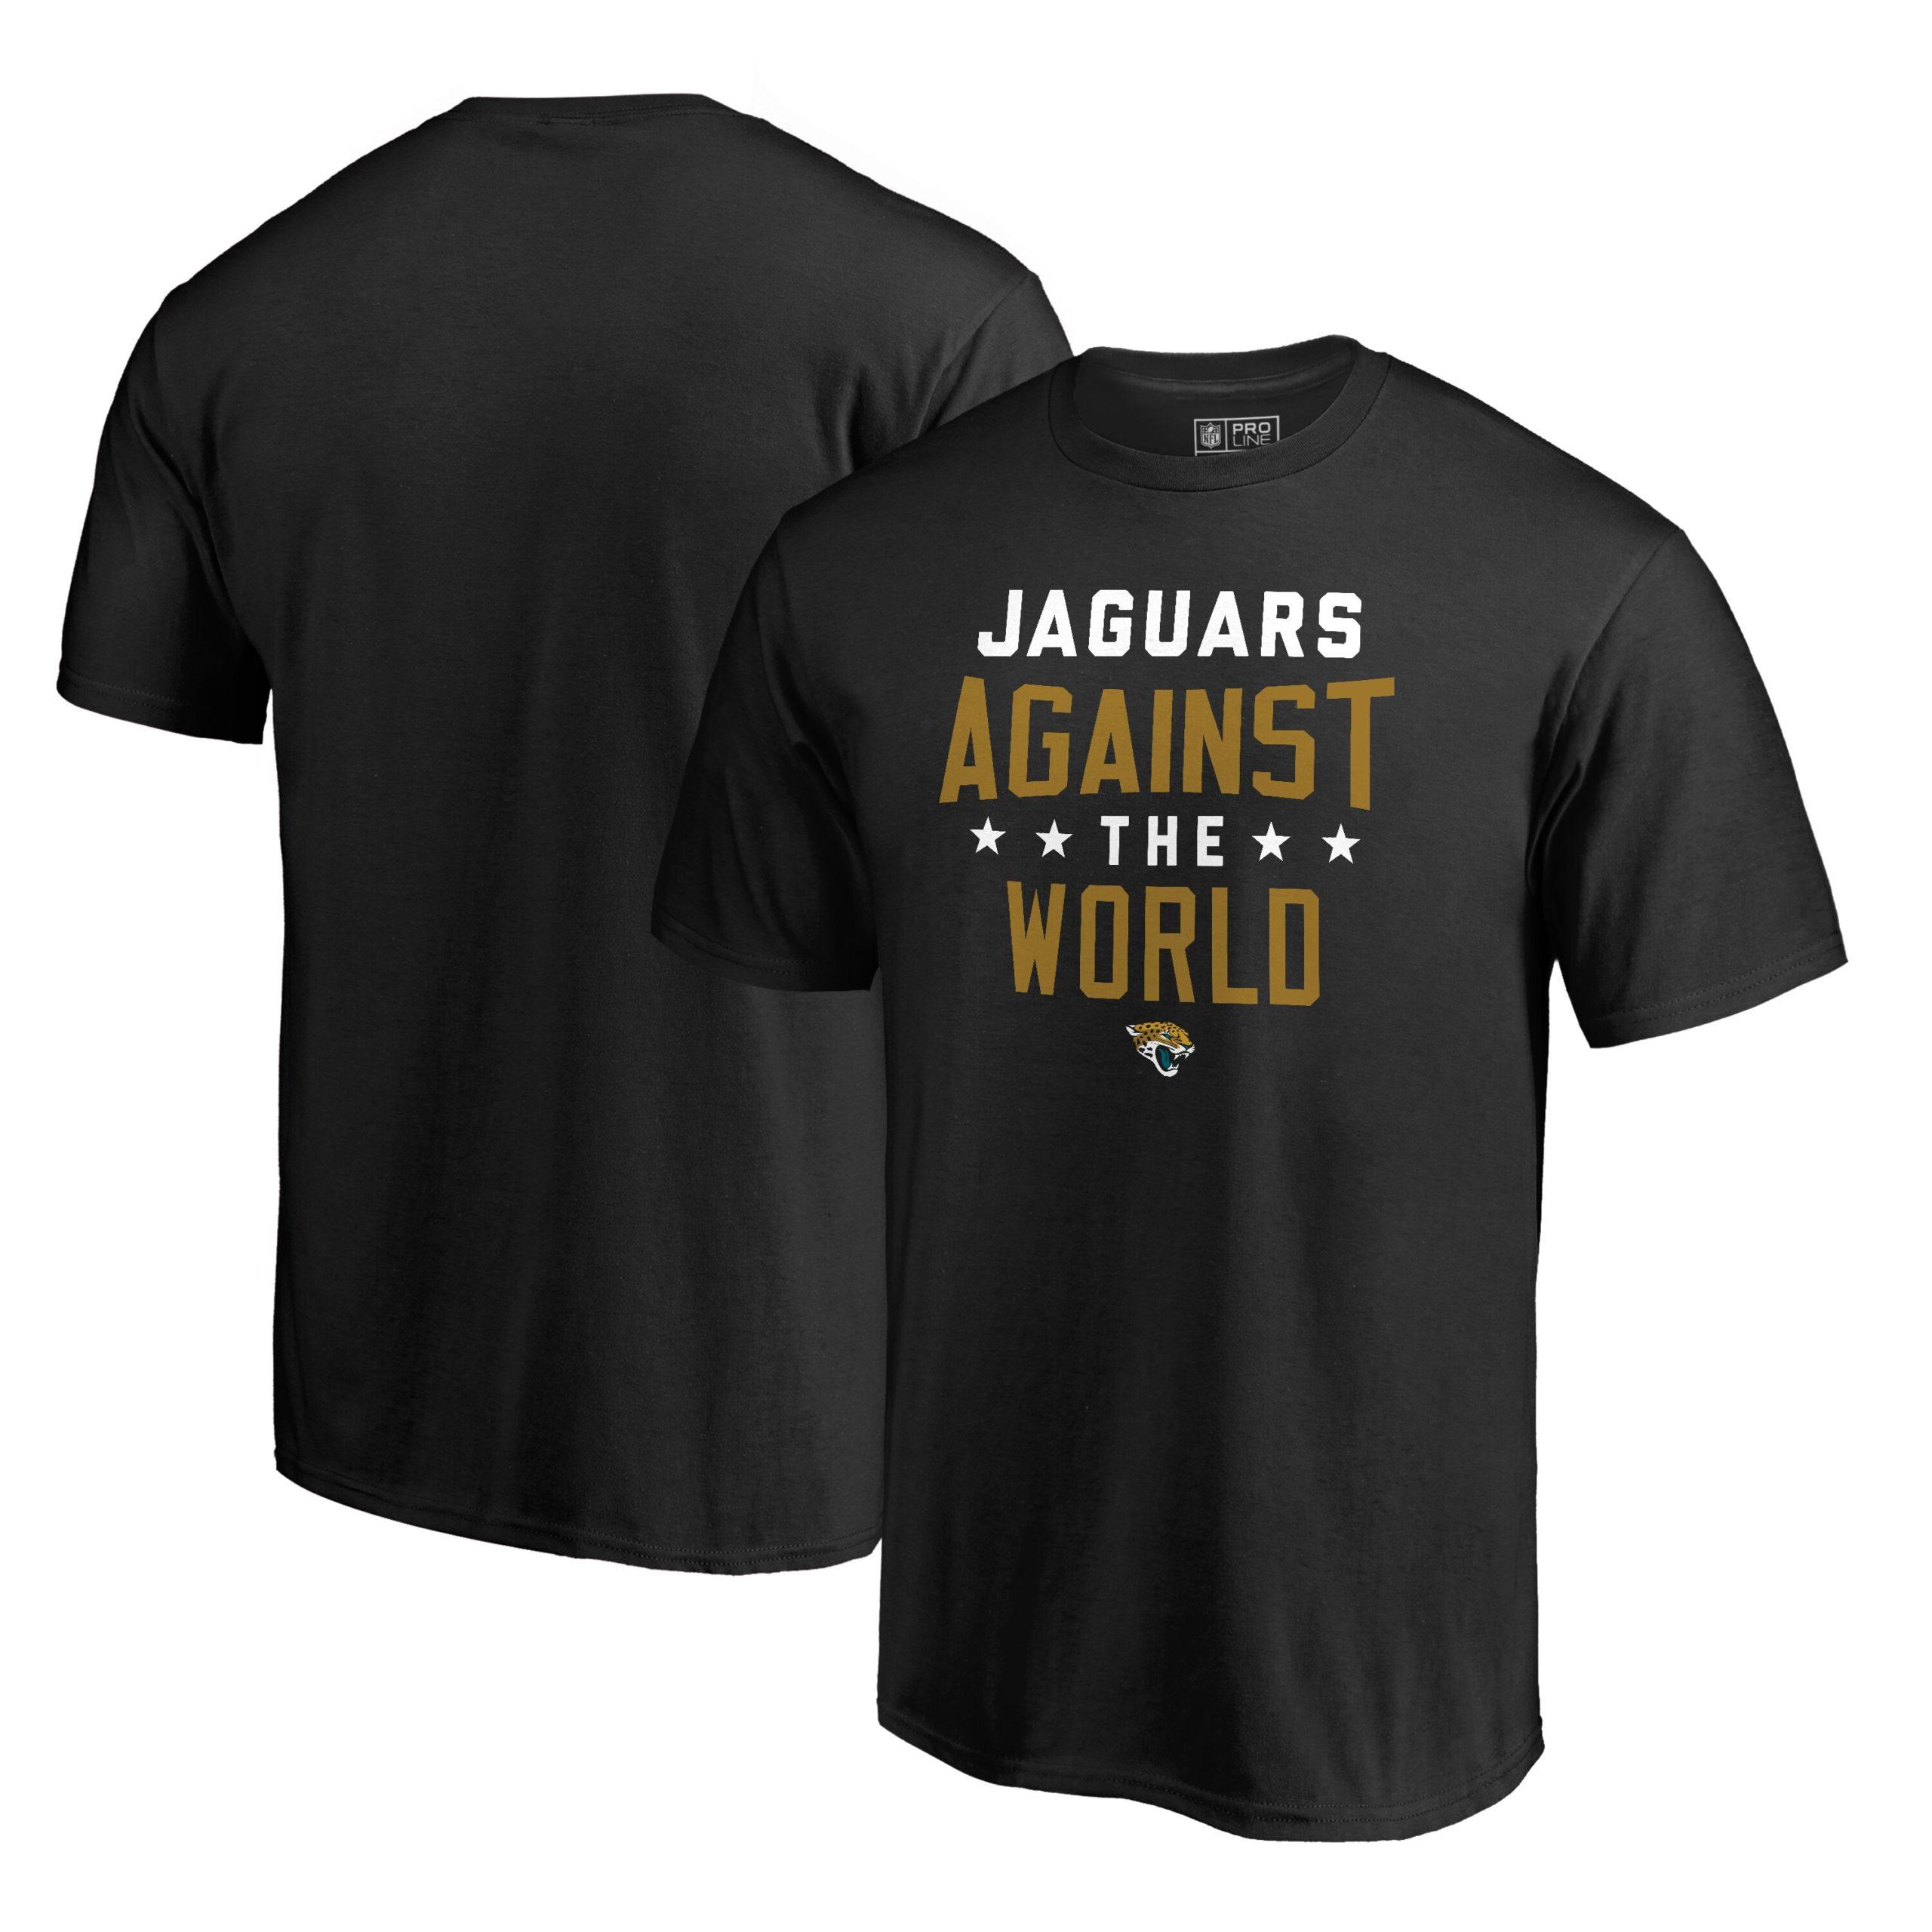 Jacksonville Jaguars NFL Pro Line by Fanatics Branded Against The World T-Shirt - Black